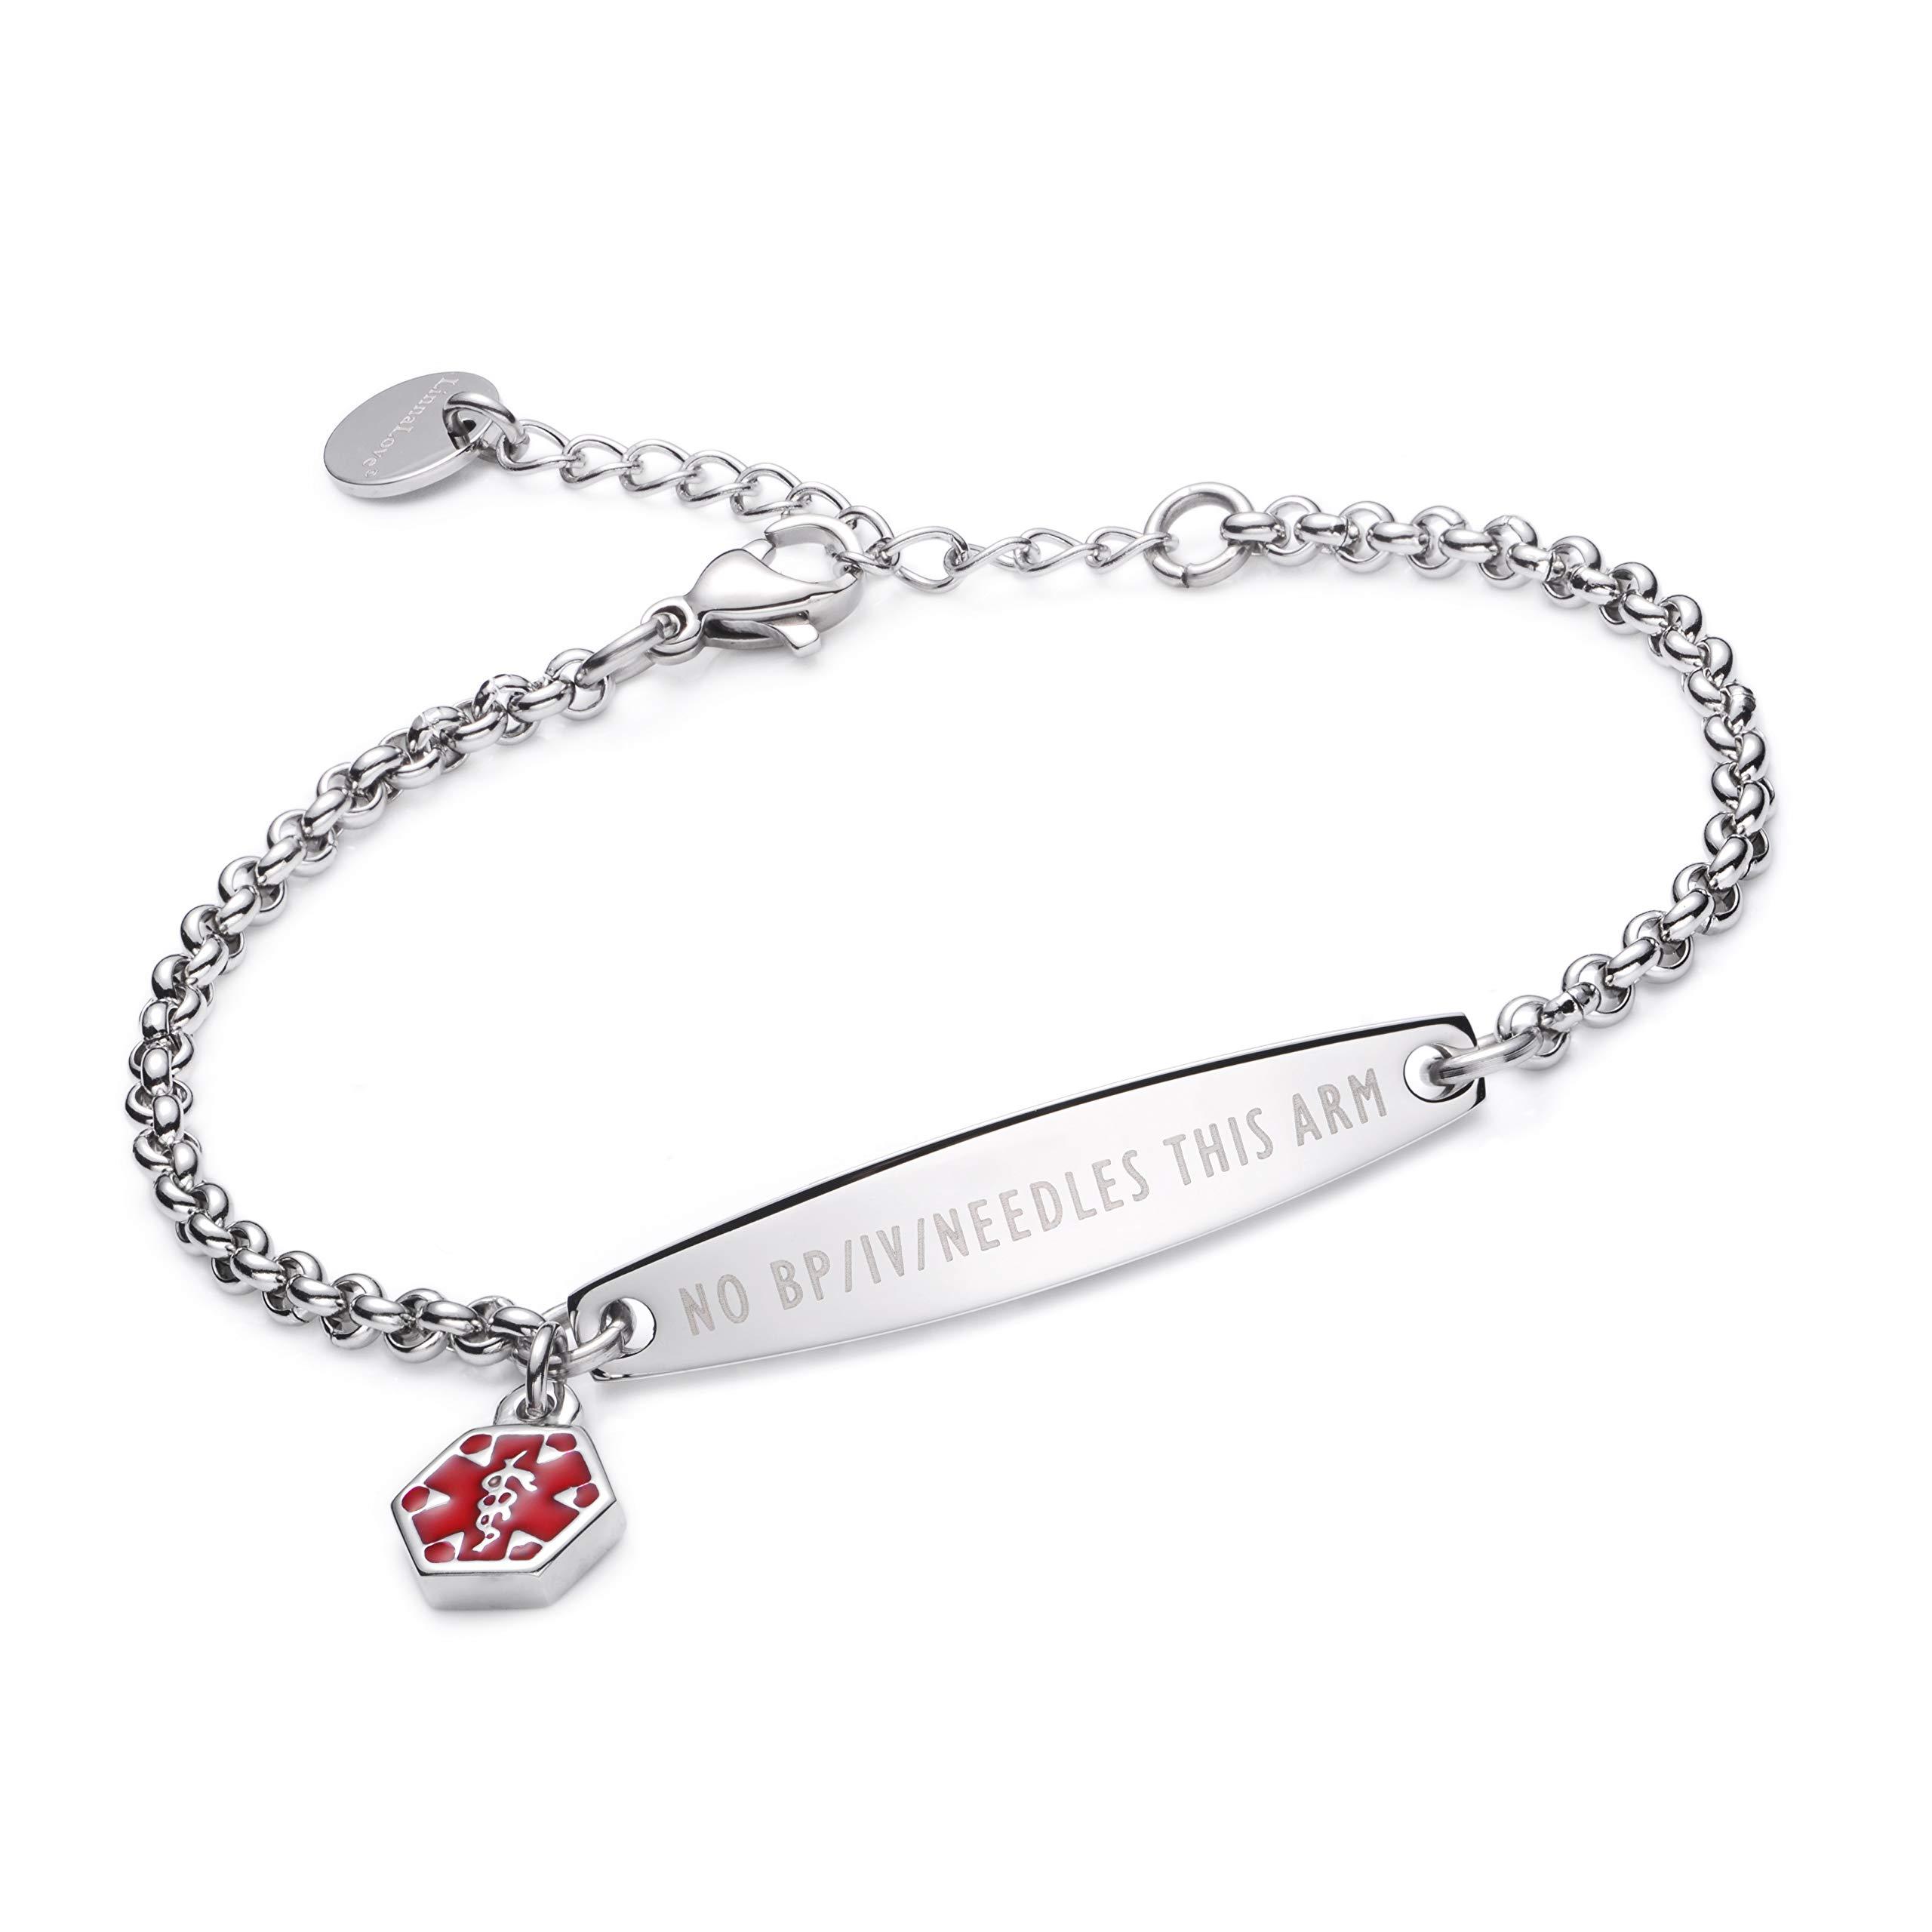 linnalove-Pre-Engraved Simple Rolo Chain Medical Alert Bracelet for Women & Girl-NO BP/IV/Needles This ARM